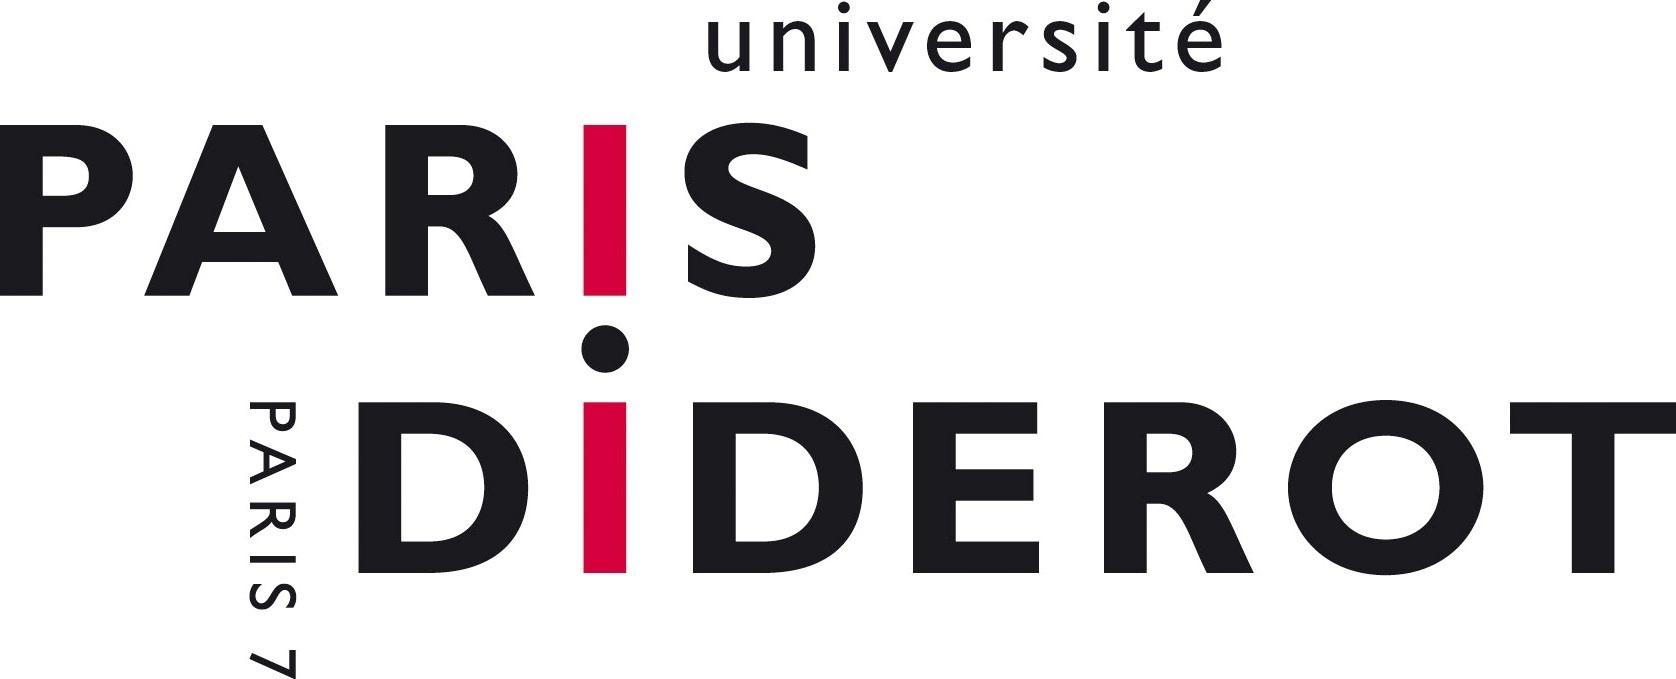 Logo_of_Paris_Diderot_University.jpg